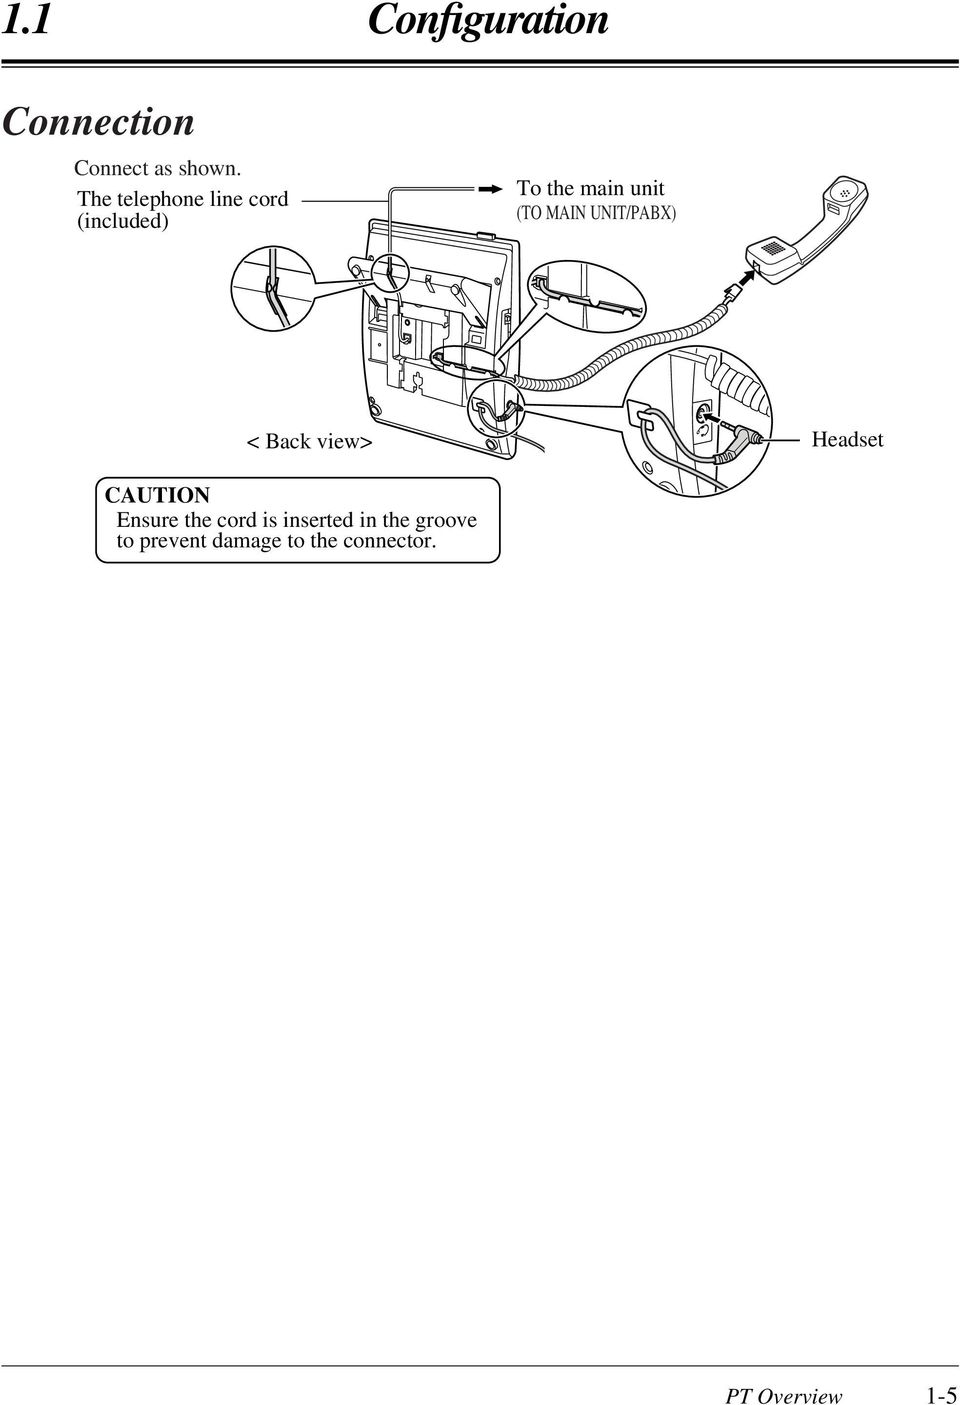 Manual Book Pabx Panasonic Kx Tes824 Bahasa Indonesia